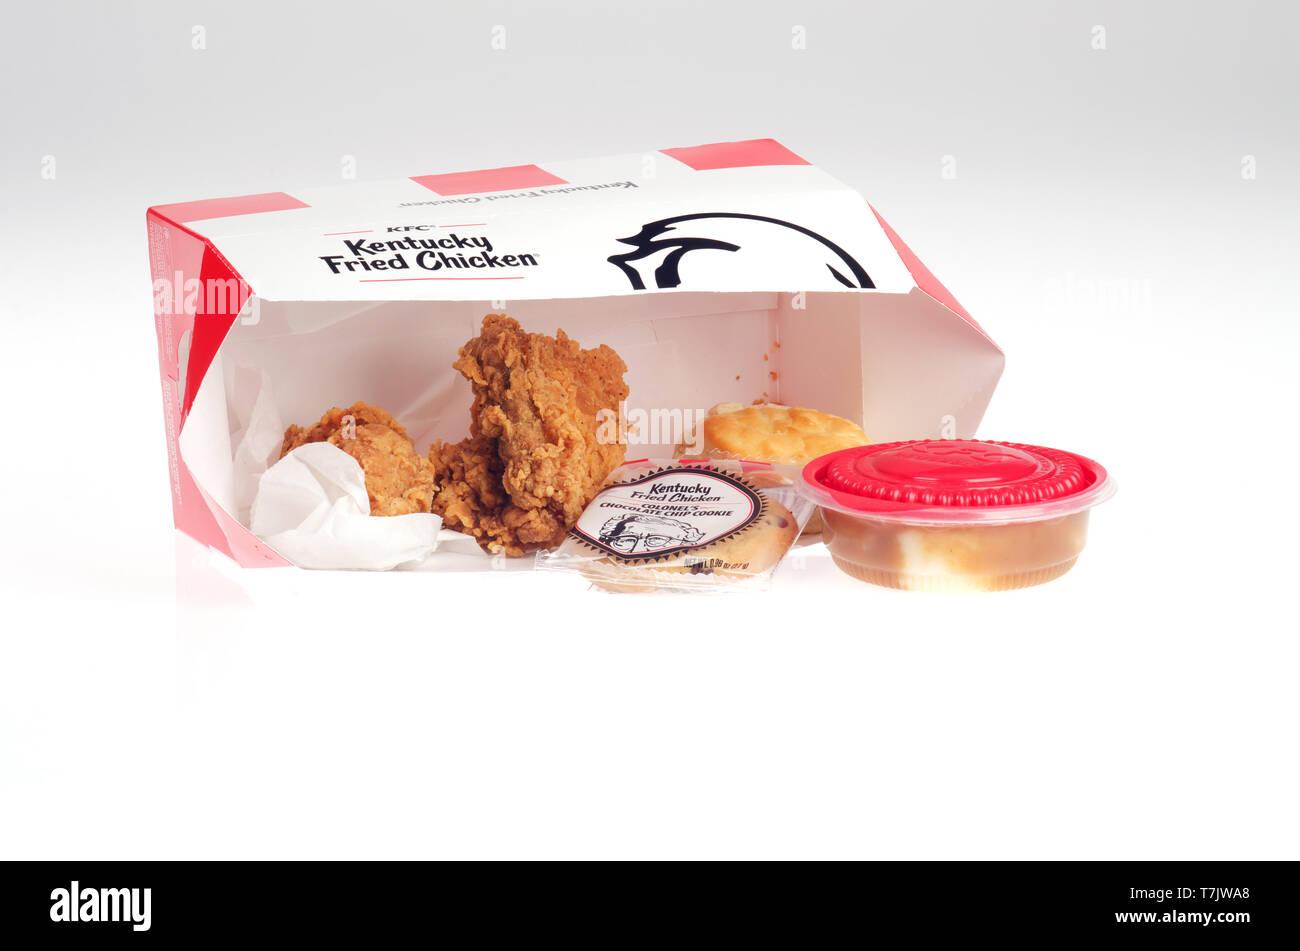 KFC $5 Fill Up meal box - Stock Image